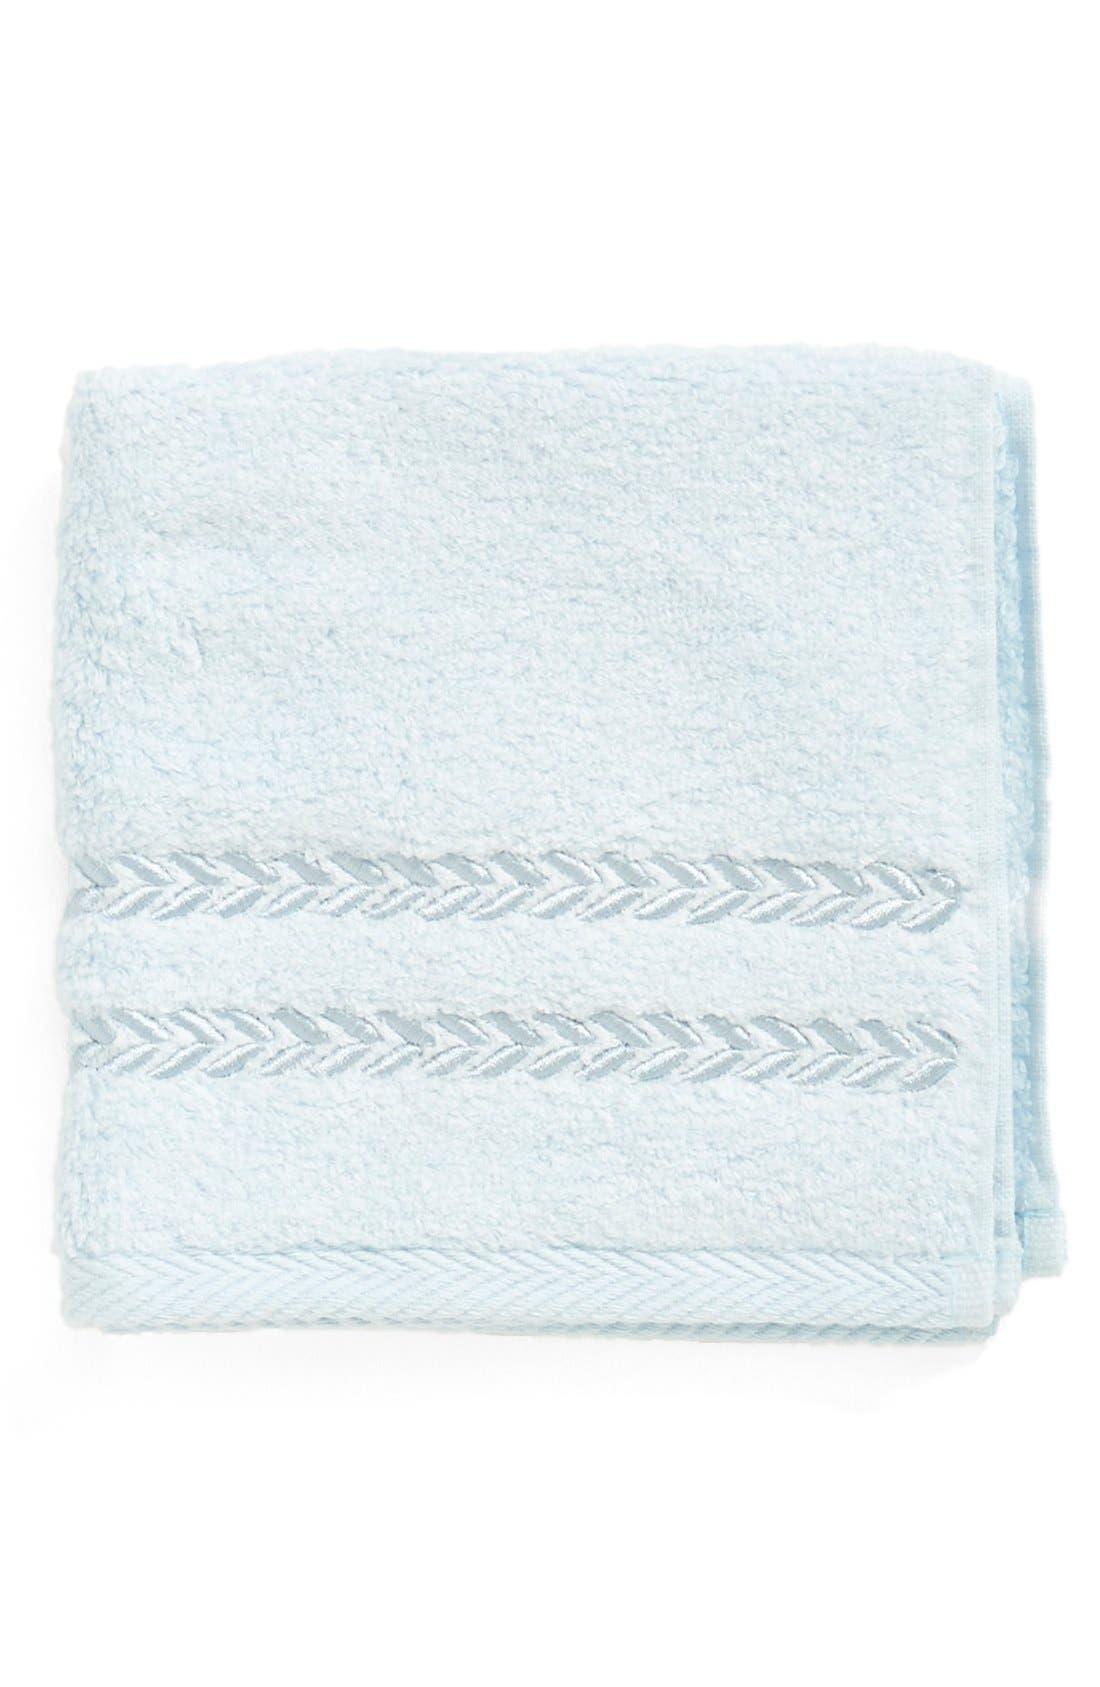 'Pearl Essence' Wash Towel,                             Main thumbnail 7, color,